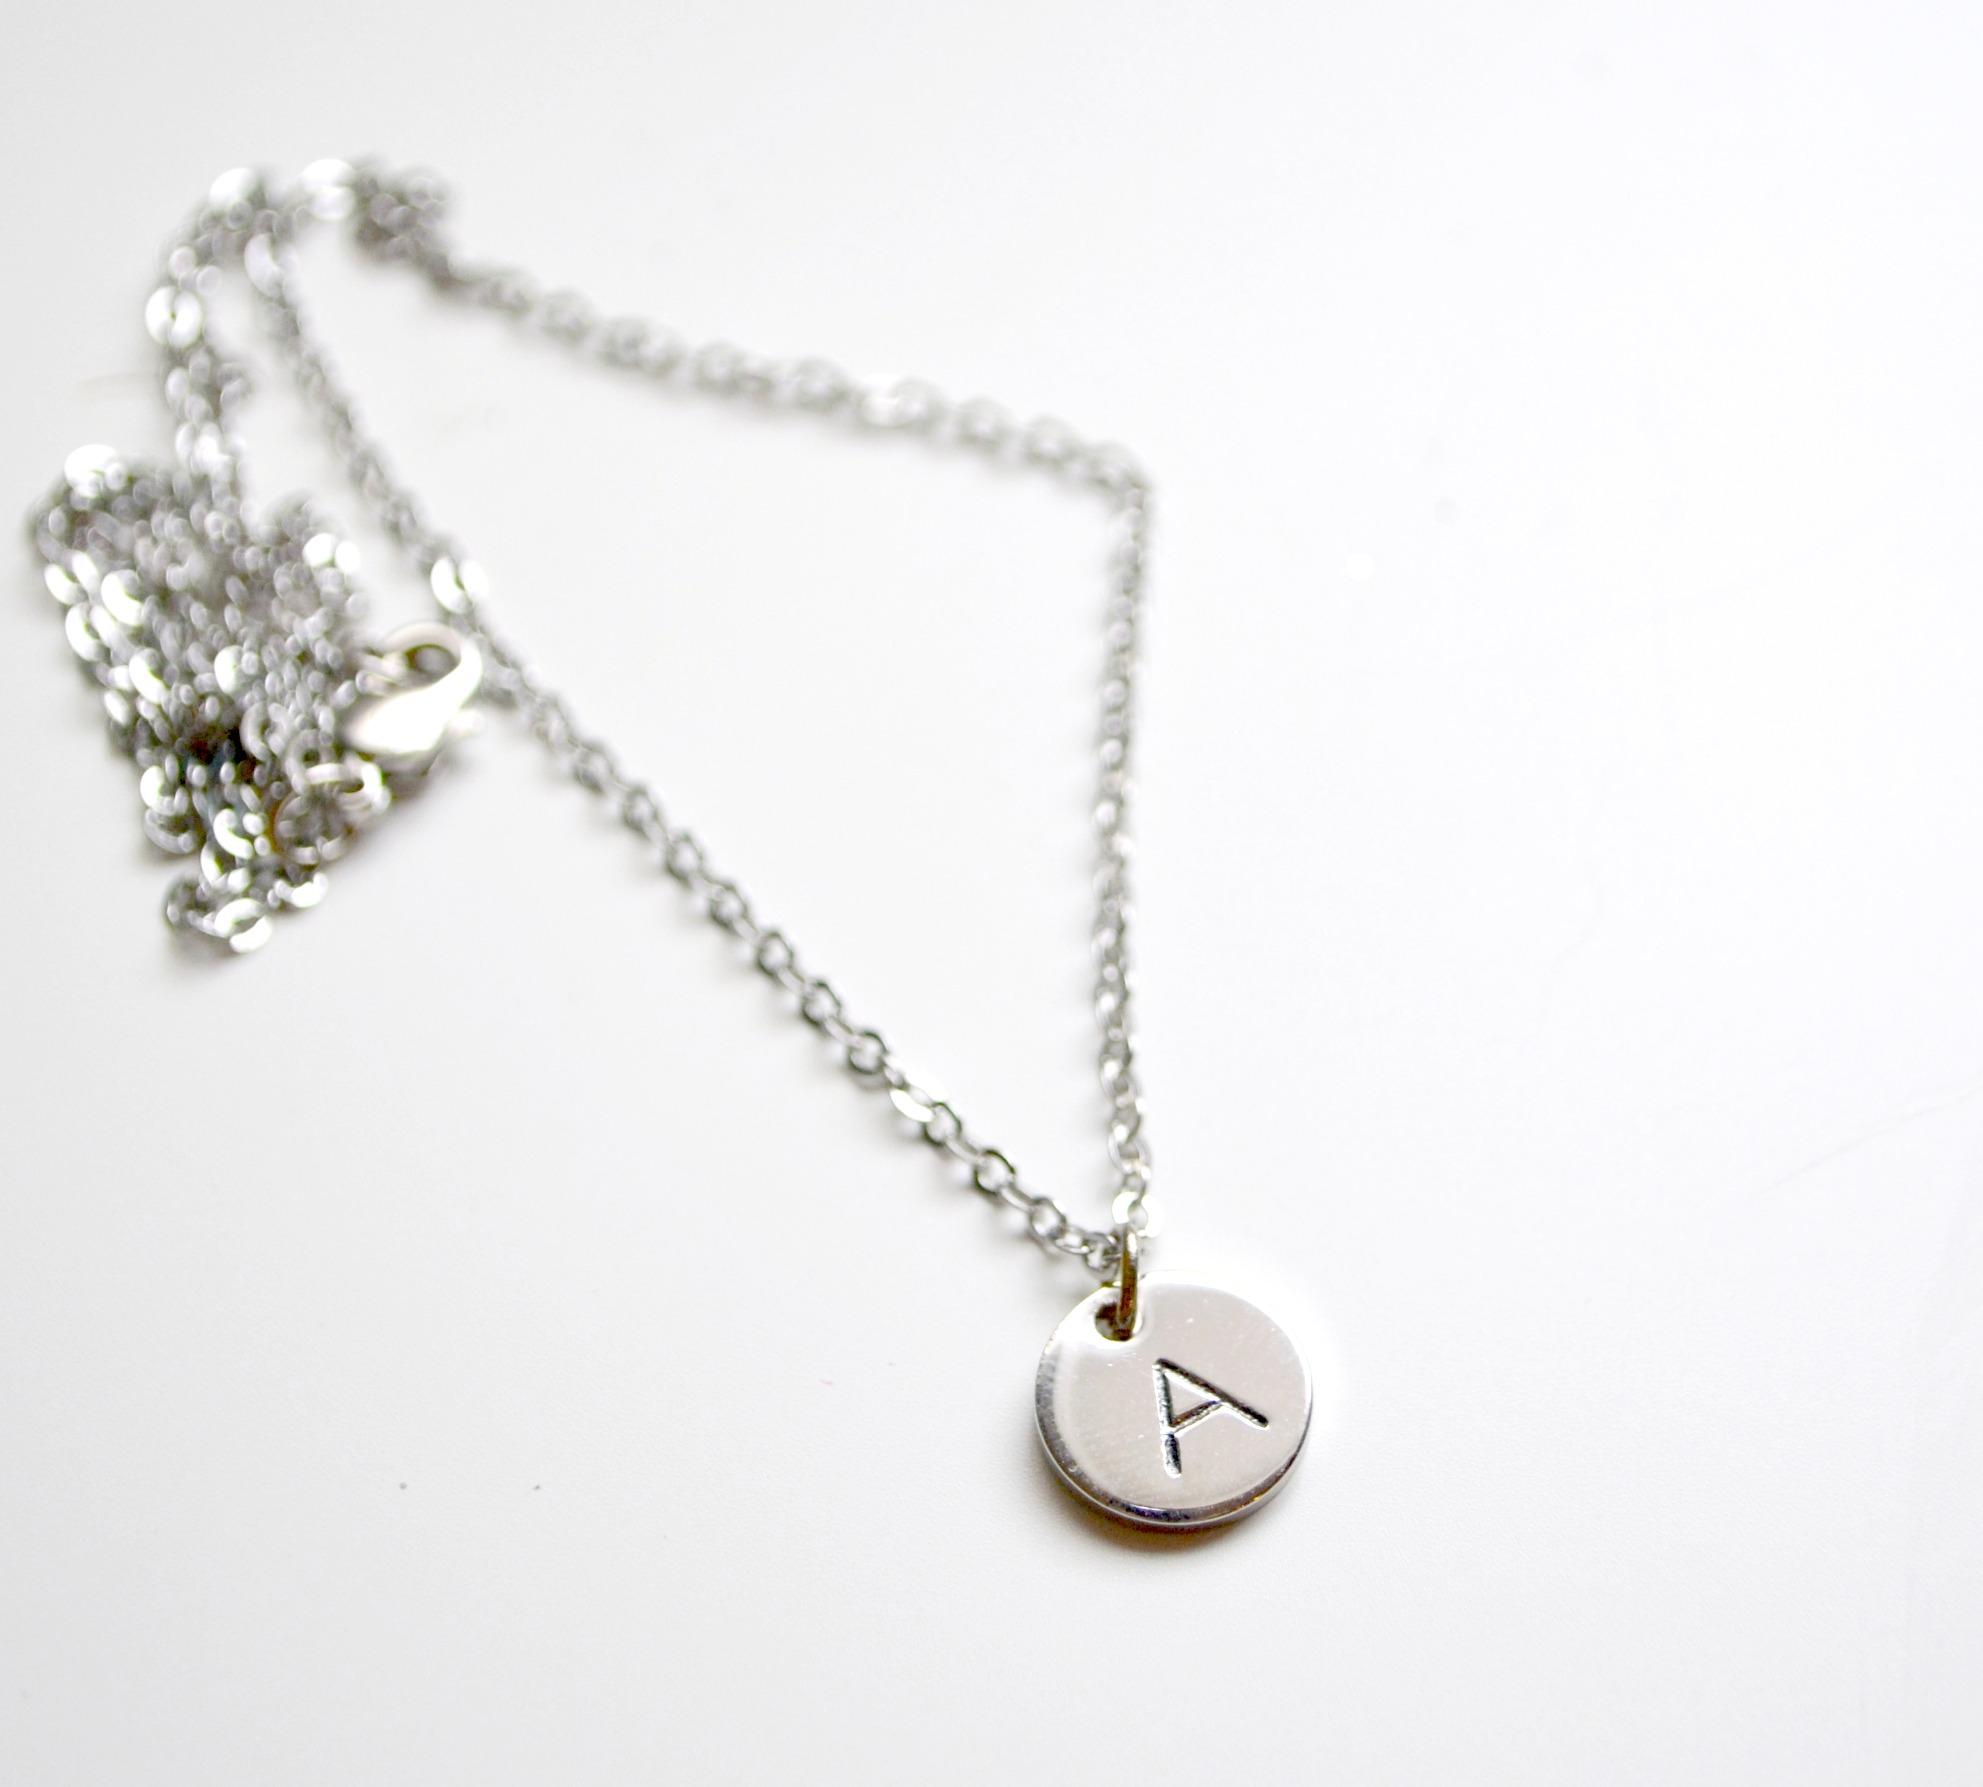 Metal Stamped Monogram Necklace